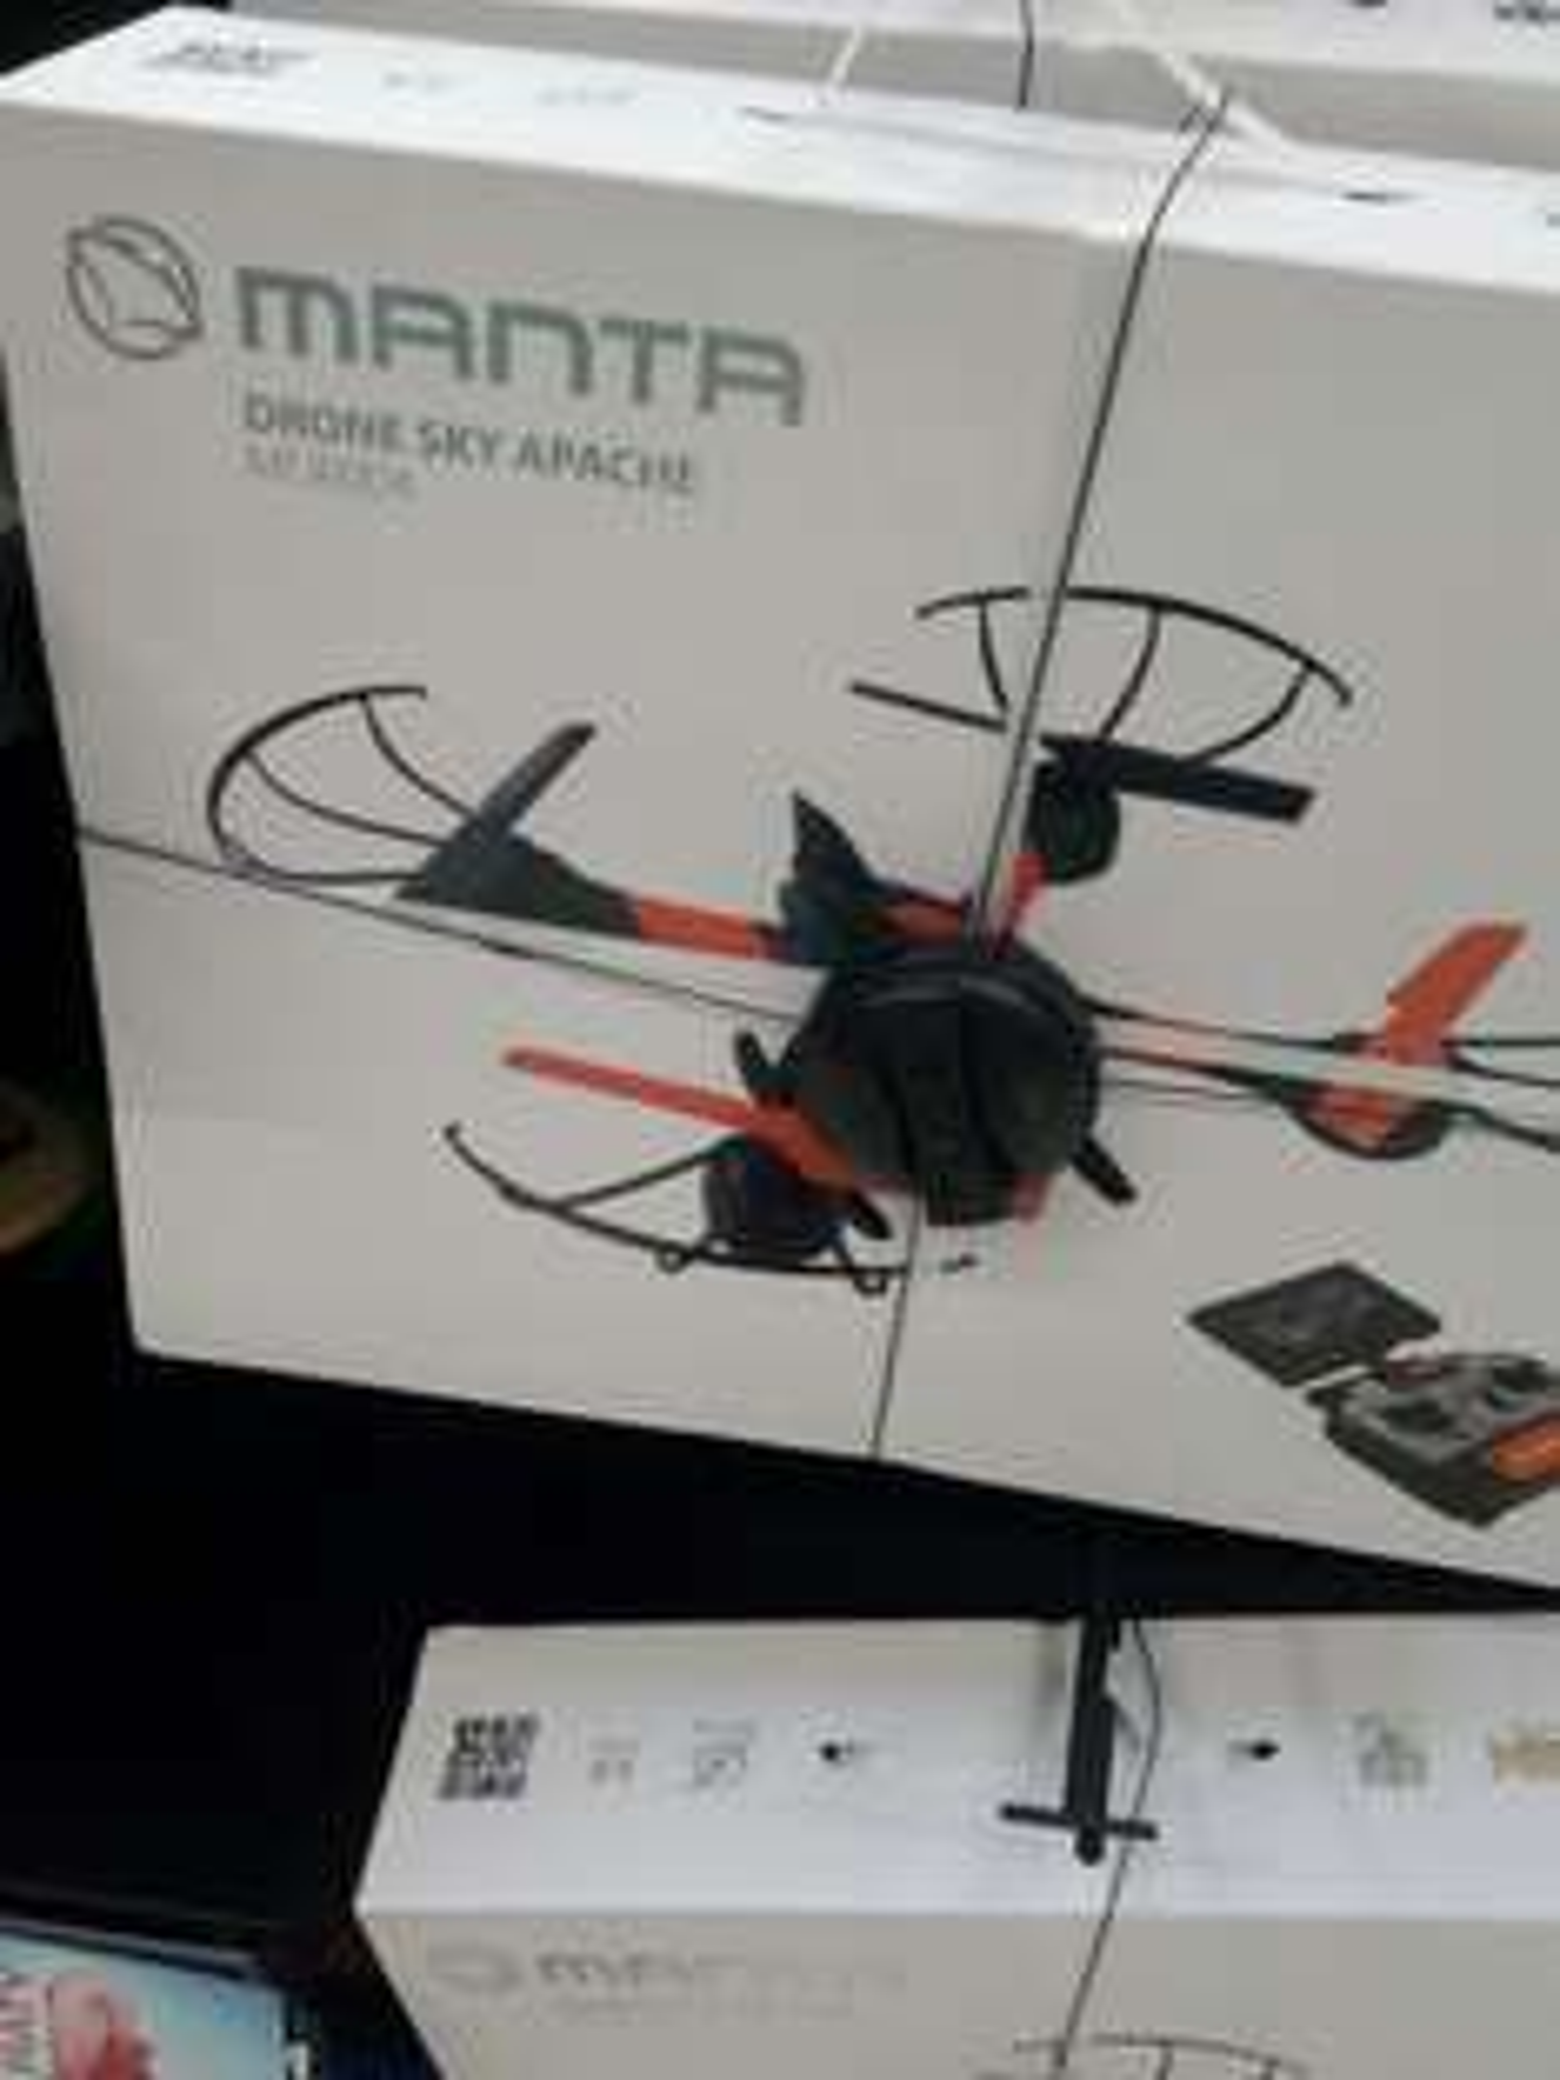 Dron Sky Apache MDR 004 @Carrefour z 549zł